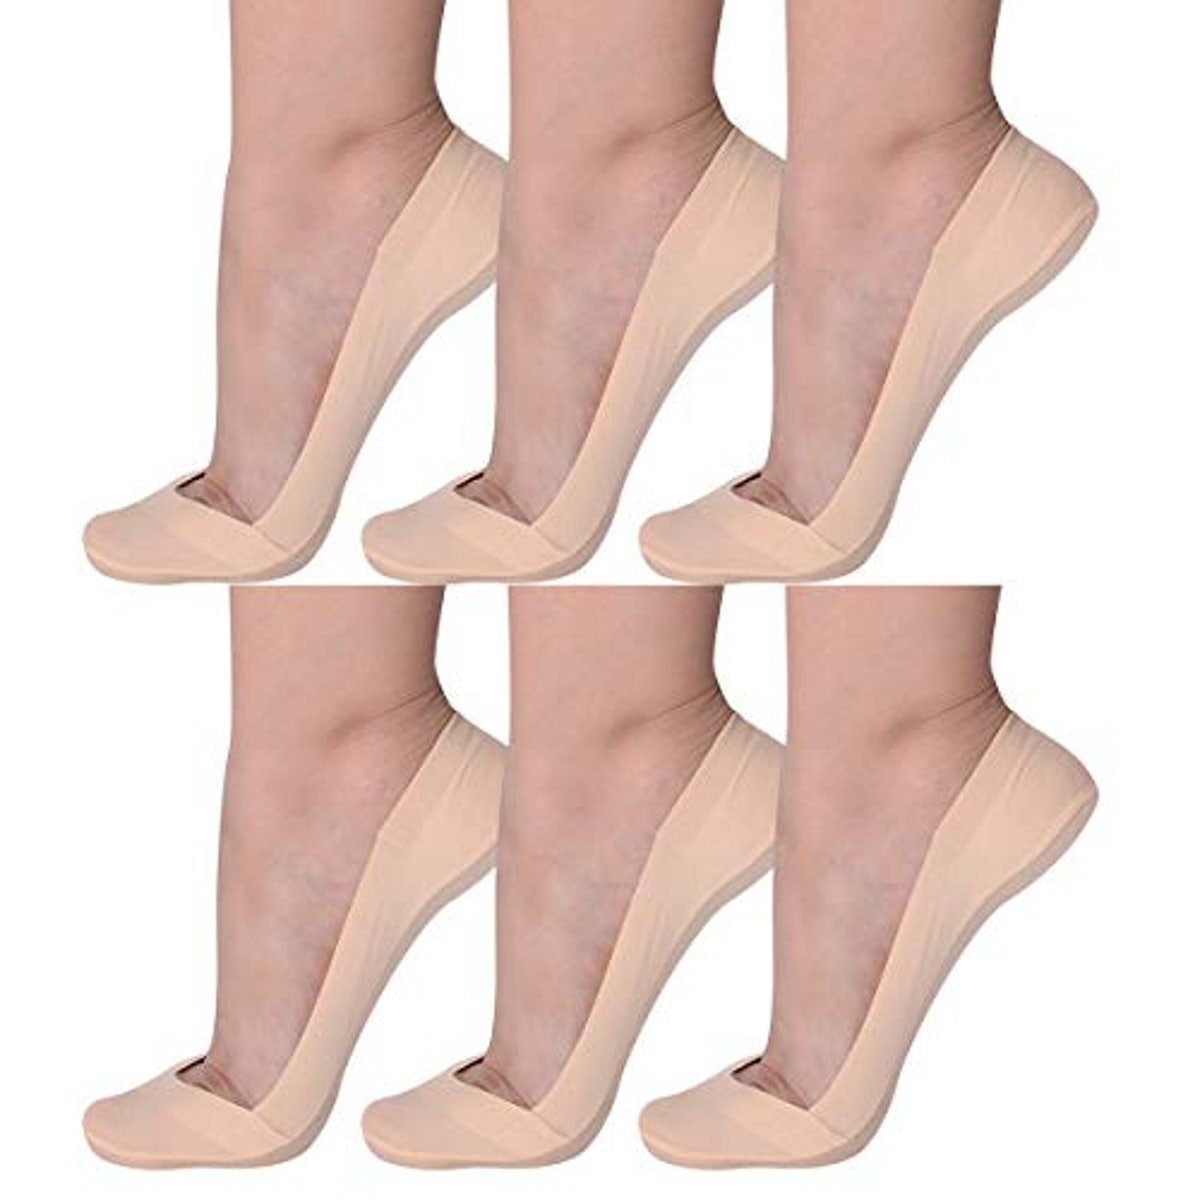 Flammi No-Show Socks (6 Pairs)